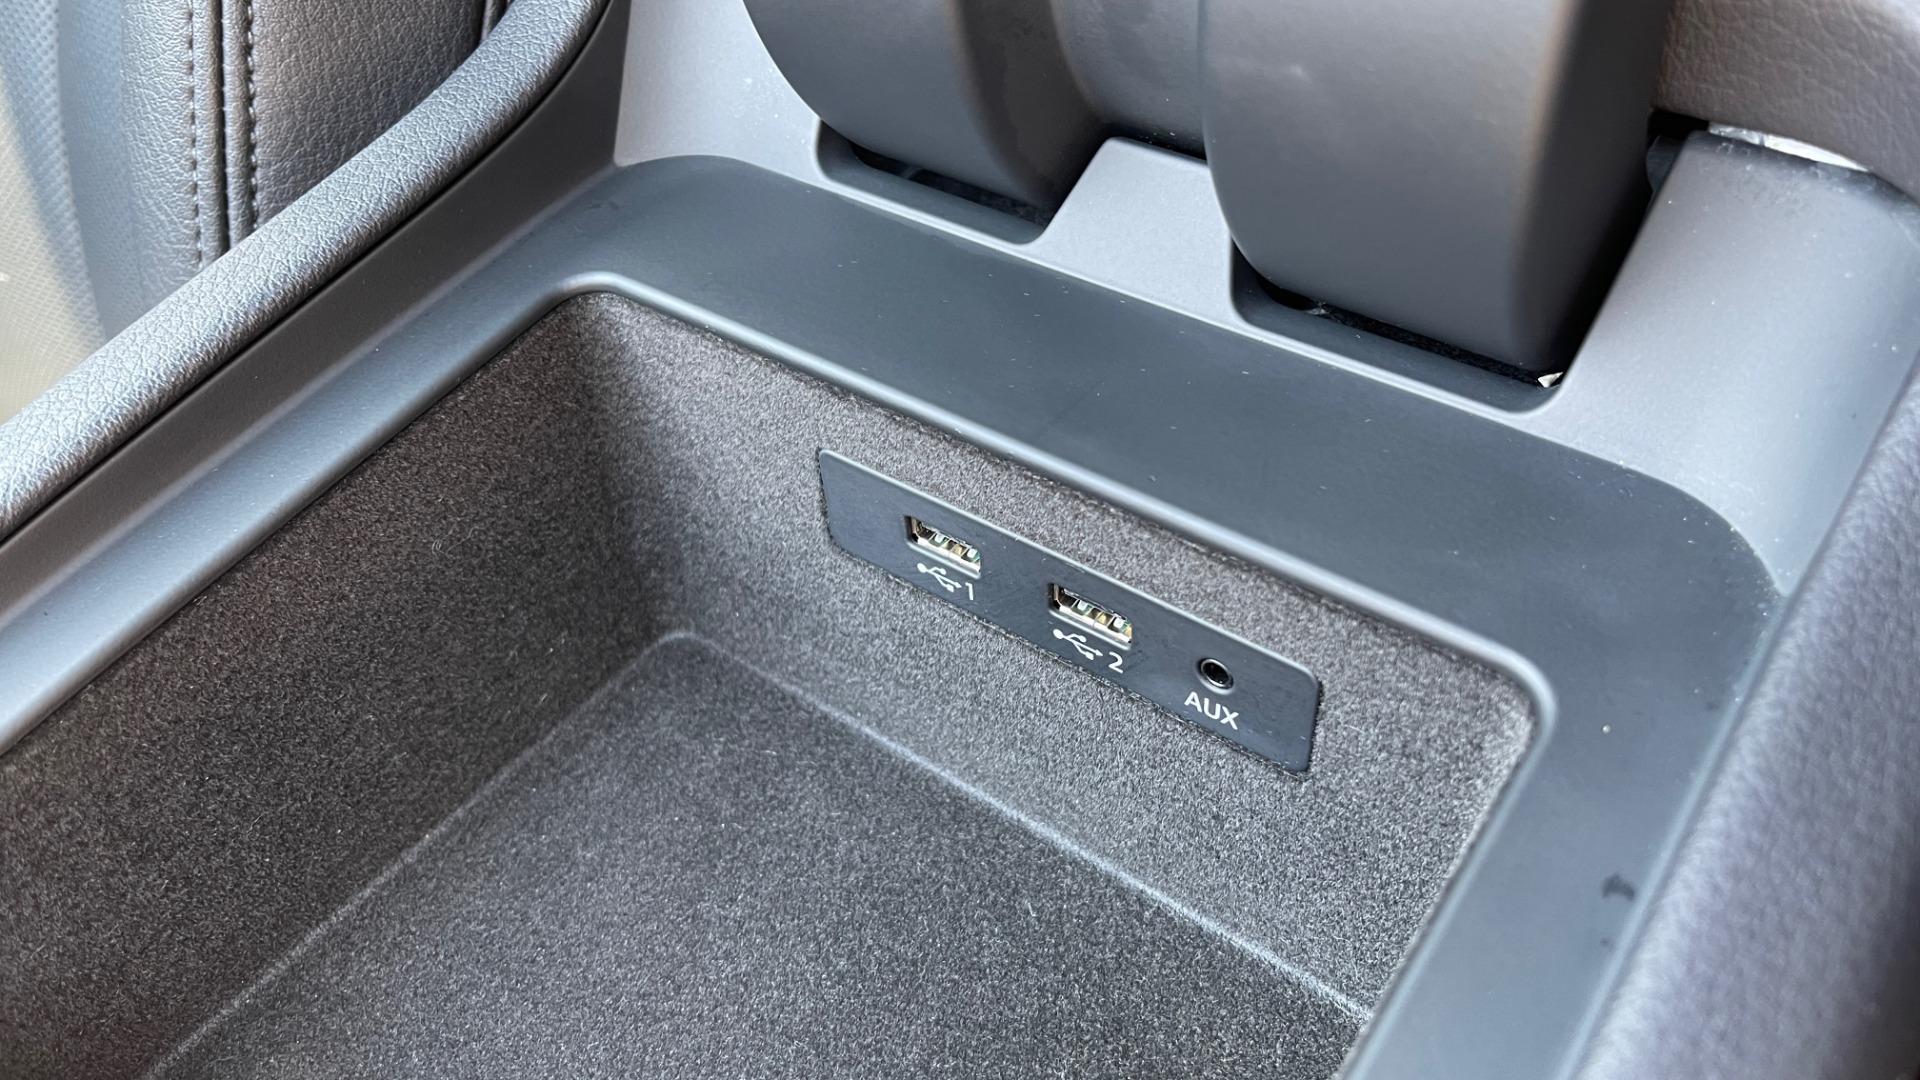 Used 2018 Audi Q7 PRESTIGE TIPTRONIC / NAV / SUNROOF / ADAPTIVE PKG / DRVR ASST / CLD WTHR /  for sale $49,995 at Formula Imports in Charlotte NC 28227 46